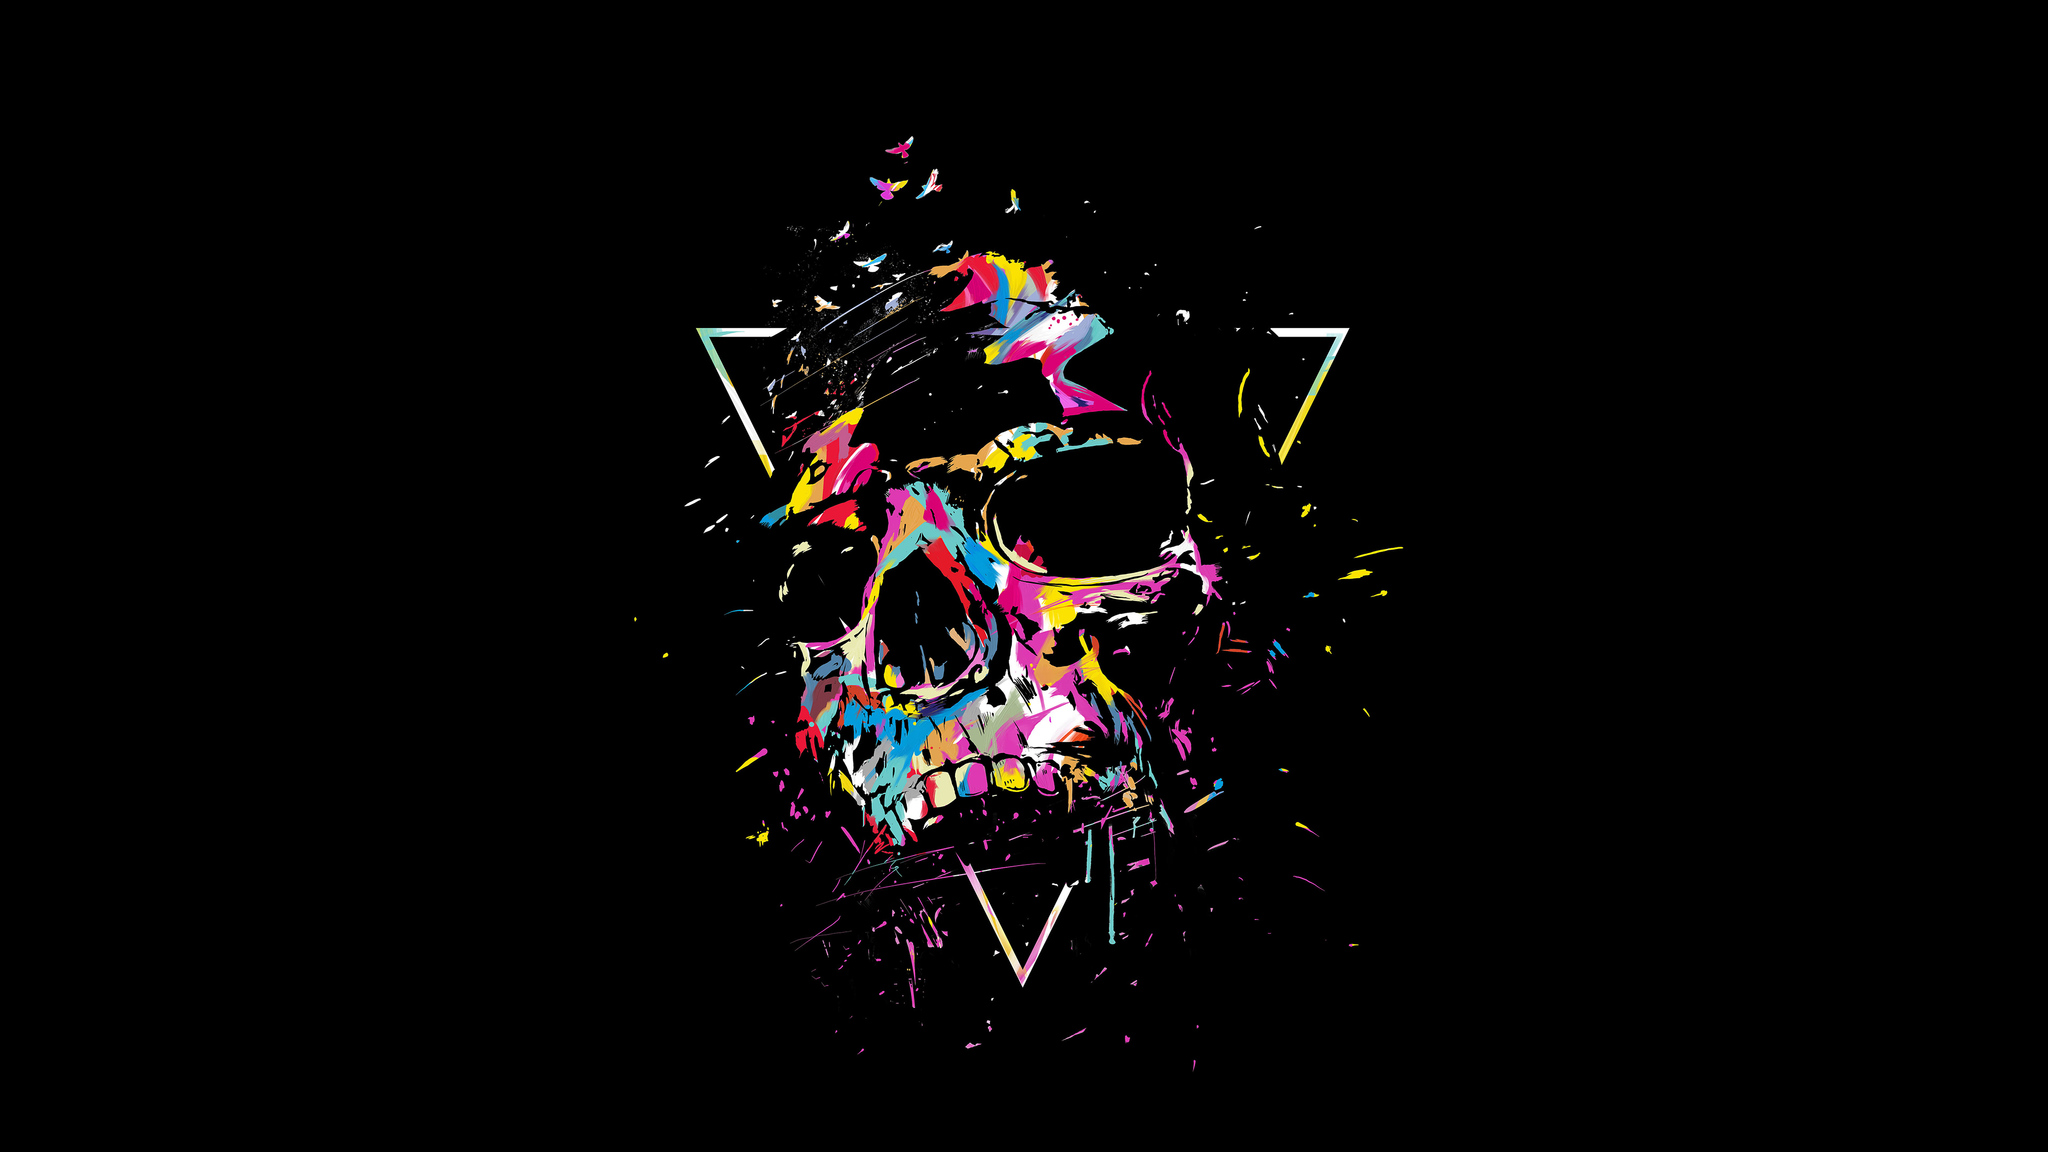 skull-color-sketch-art-4k-5c.jpg